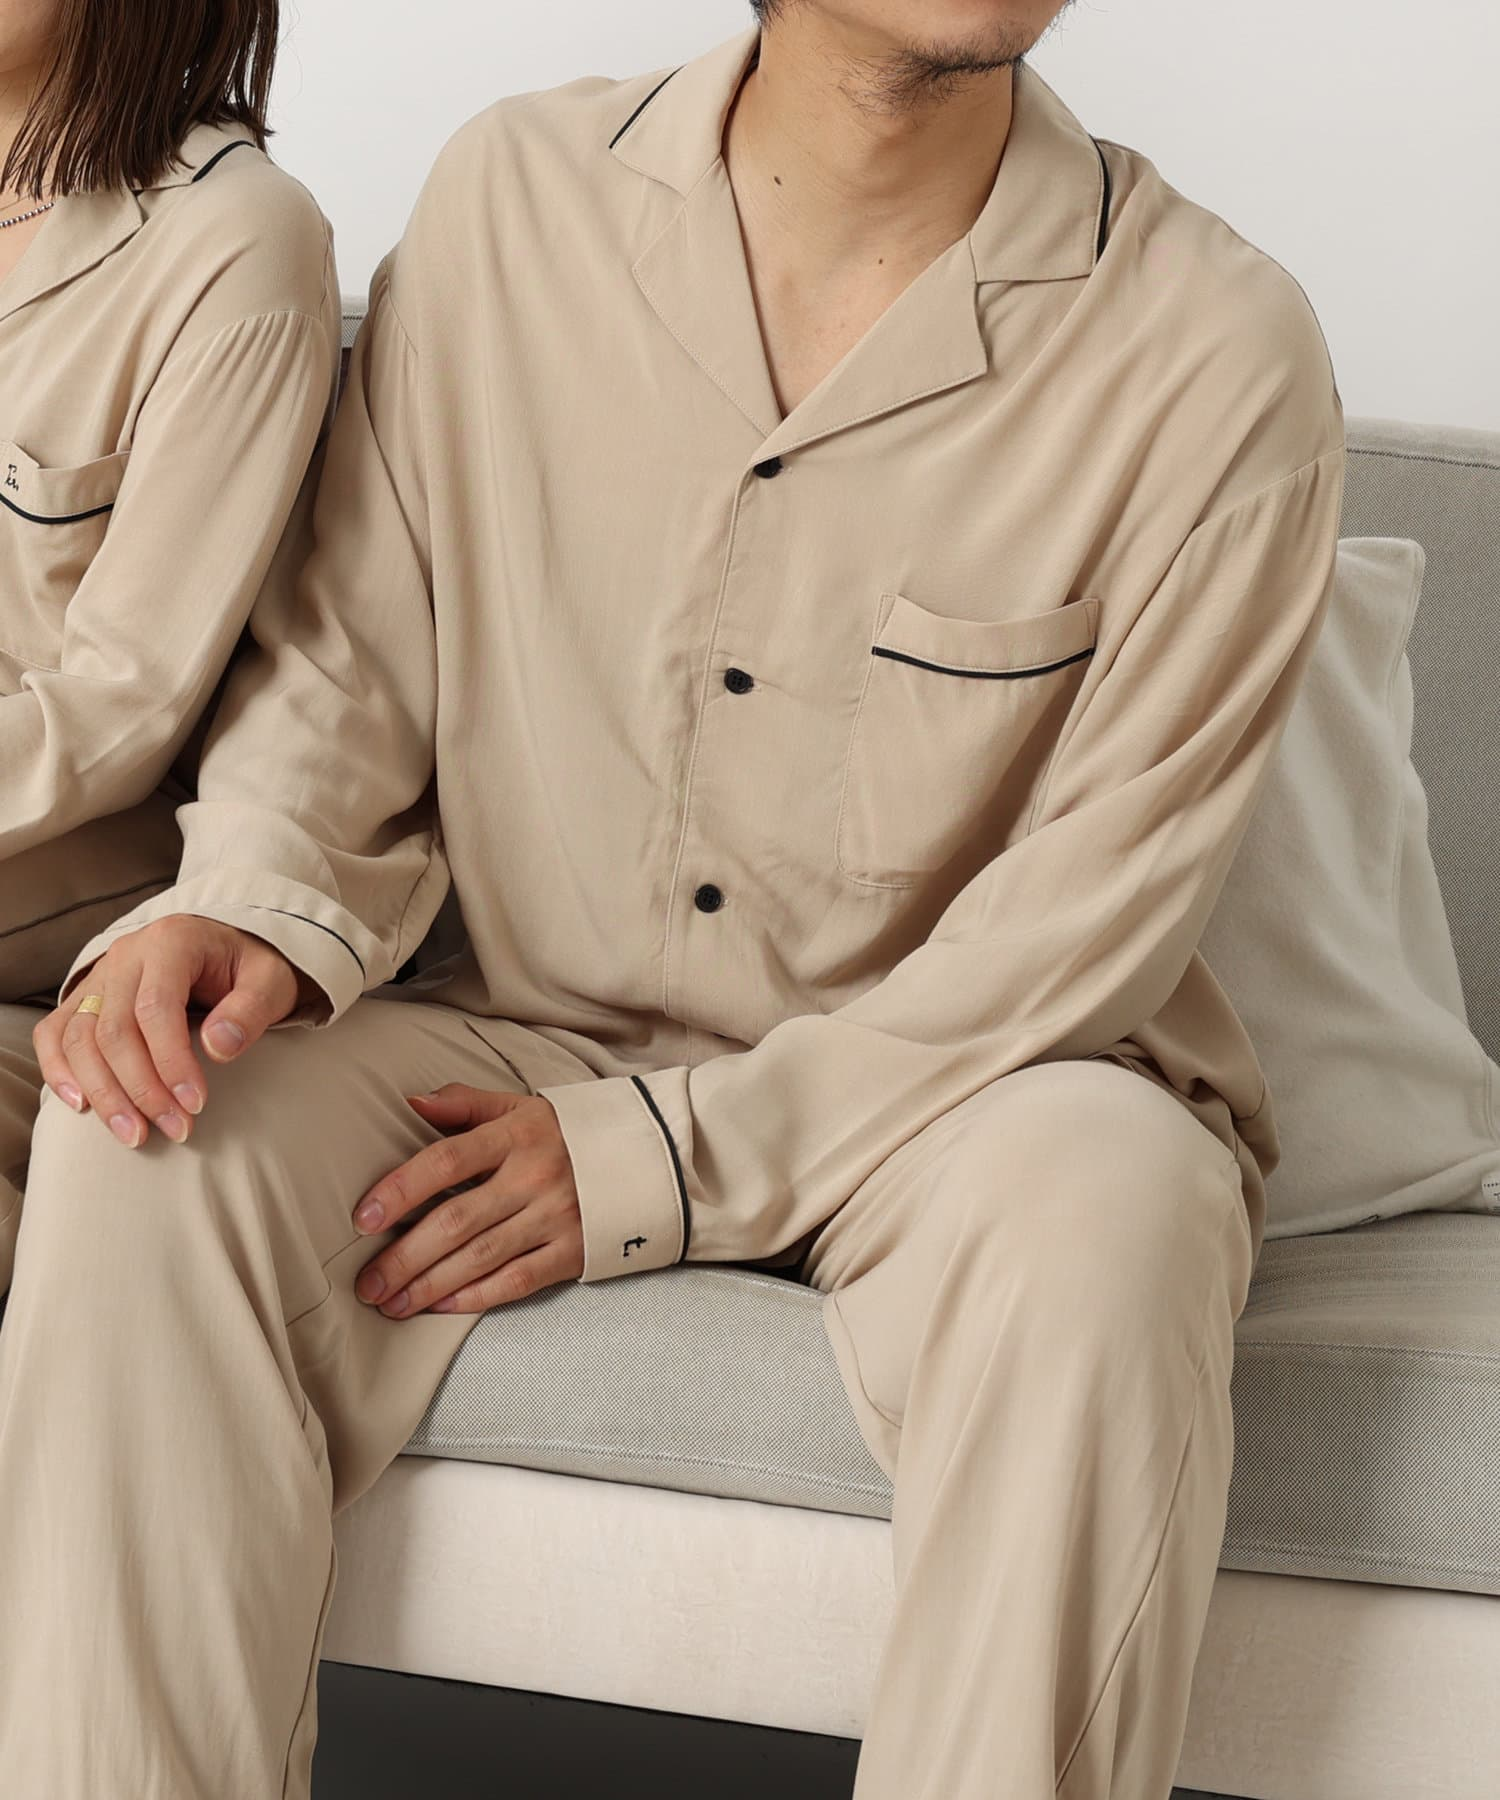 TERRITOIRE(テリトワール) 【しあわせな眠りを】MENS 快眠リラックスパジャマ 上下セット